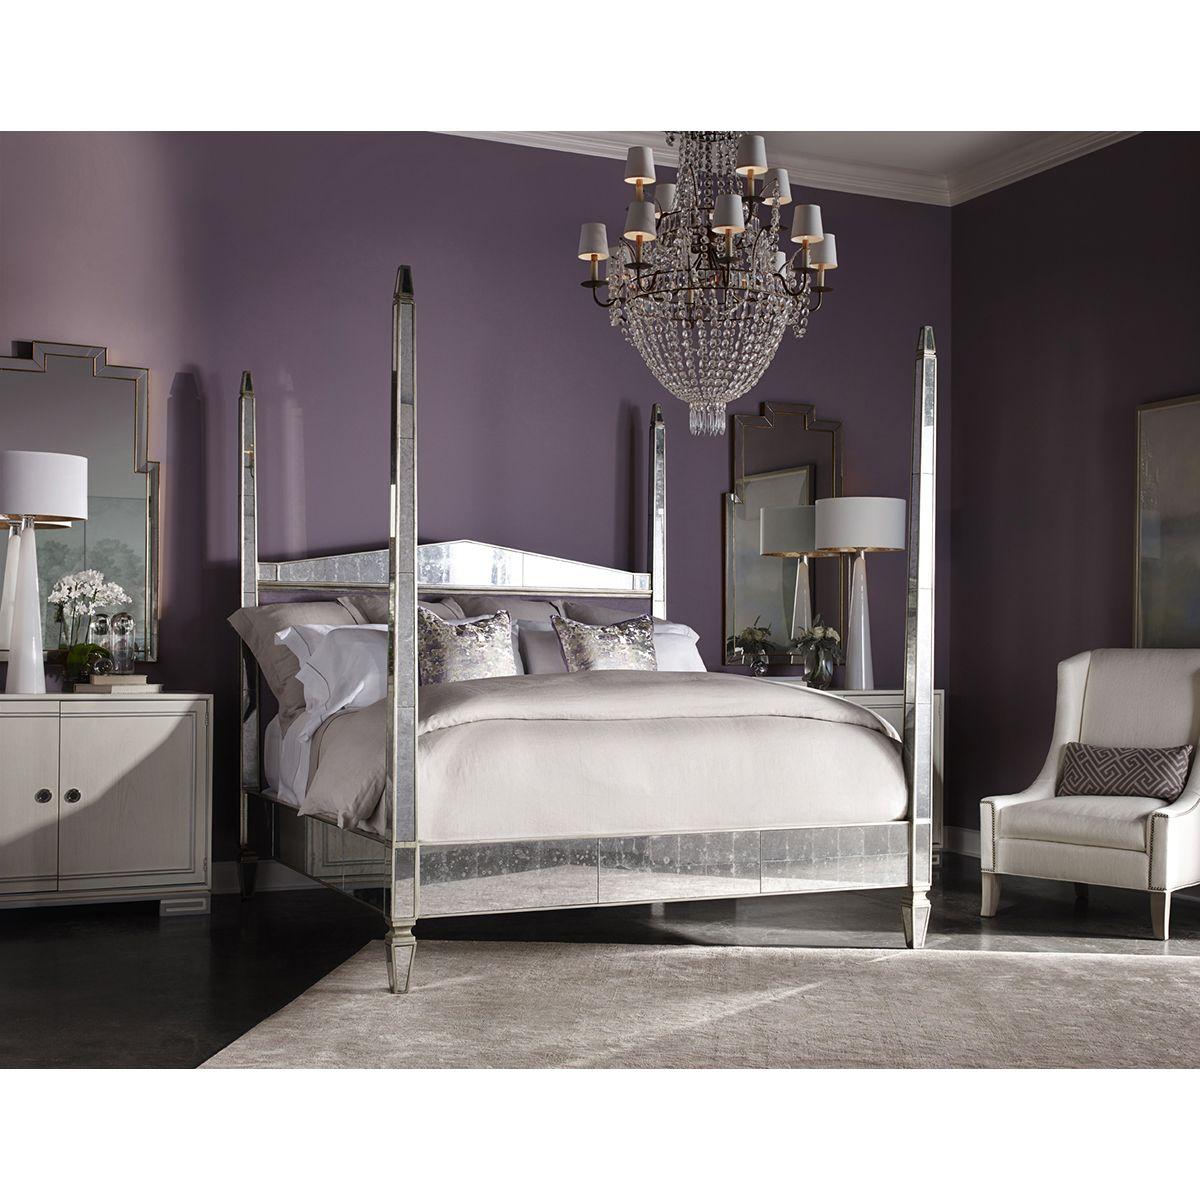 Lillian August Arlington King Bed Furniture, Fine